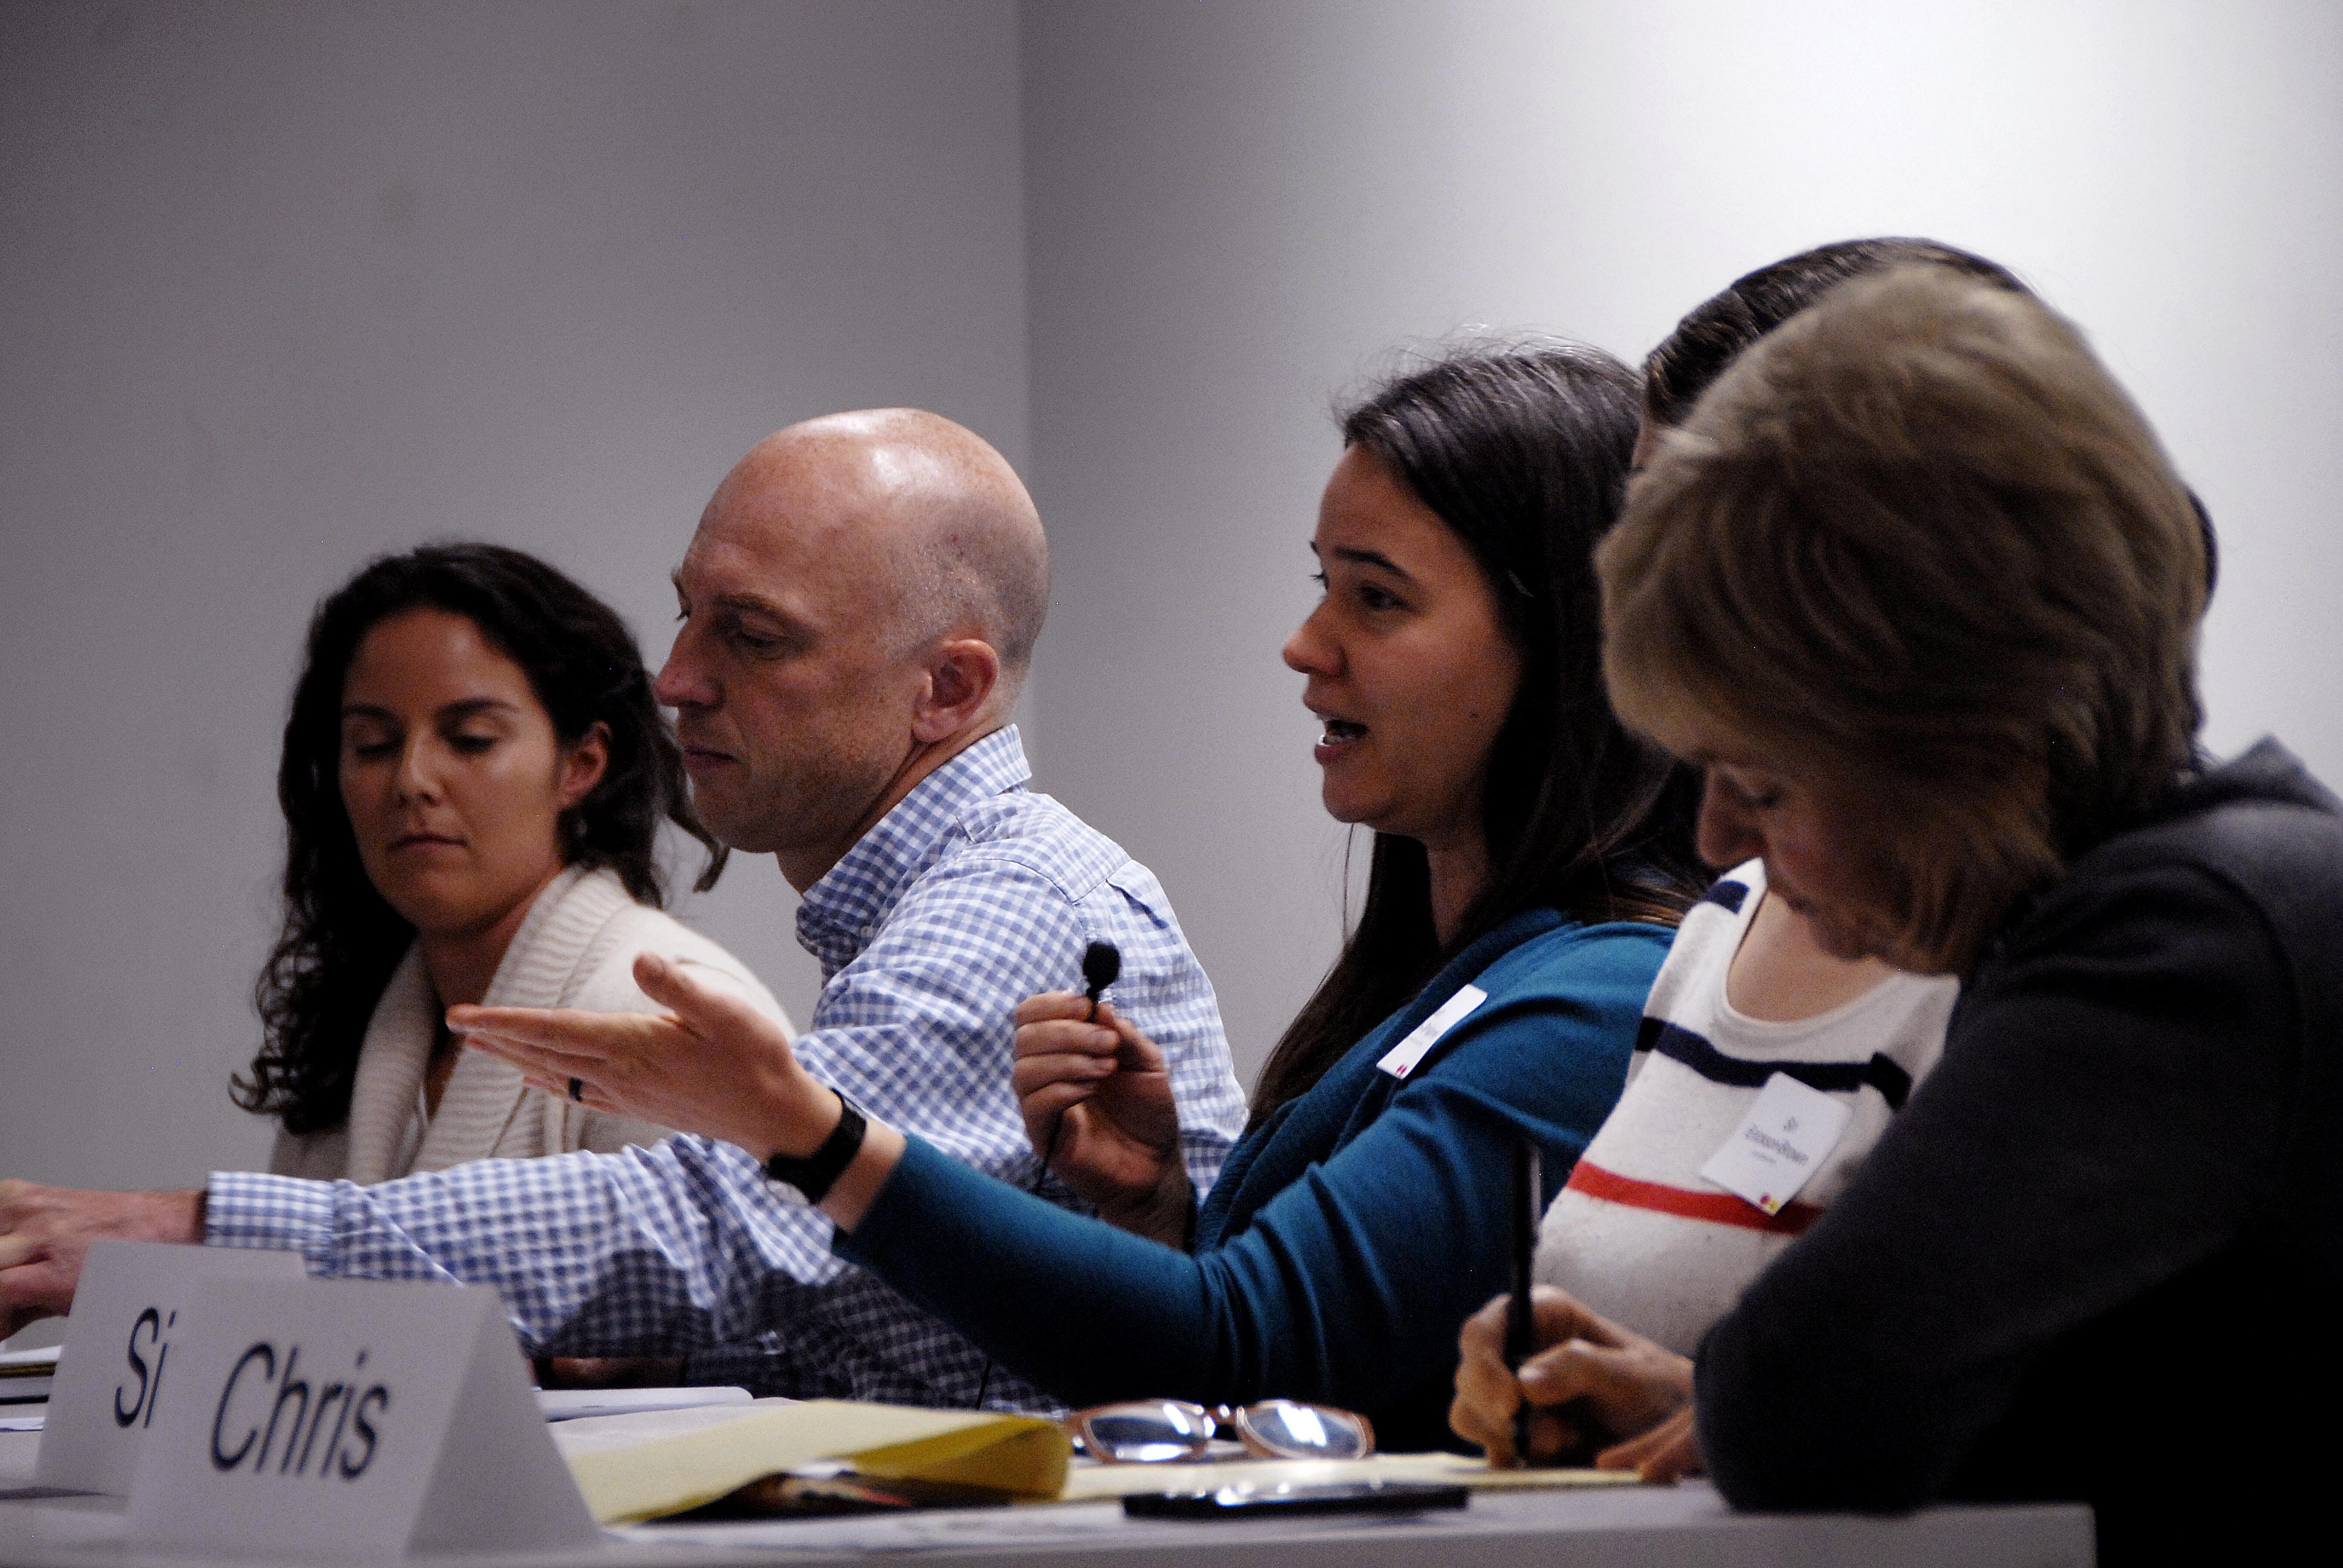 Panelists speaking at summit